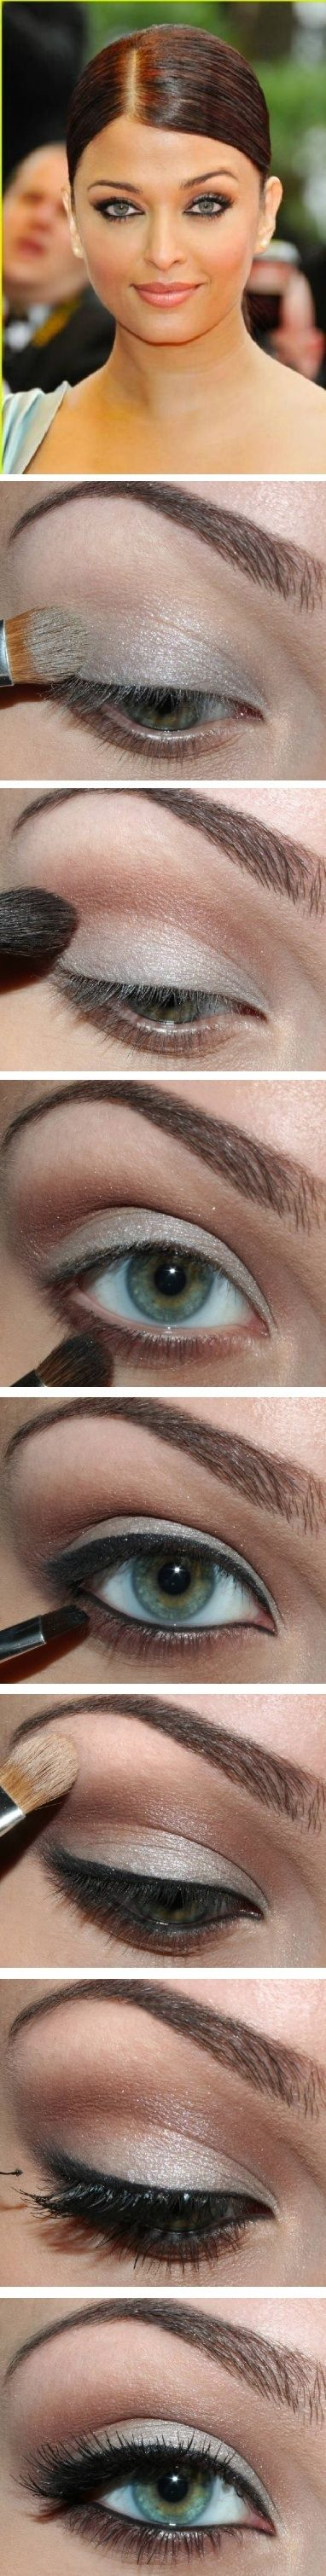 Aishwarya Rai eye makeup